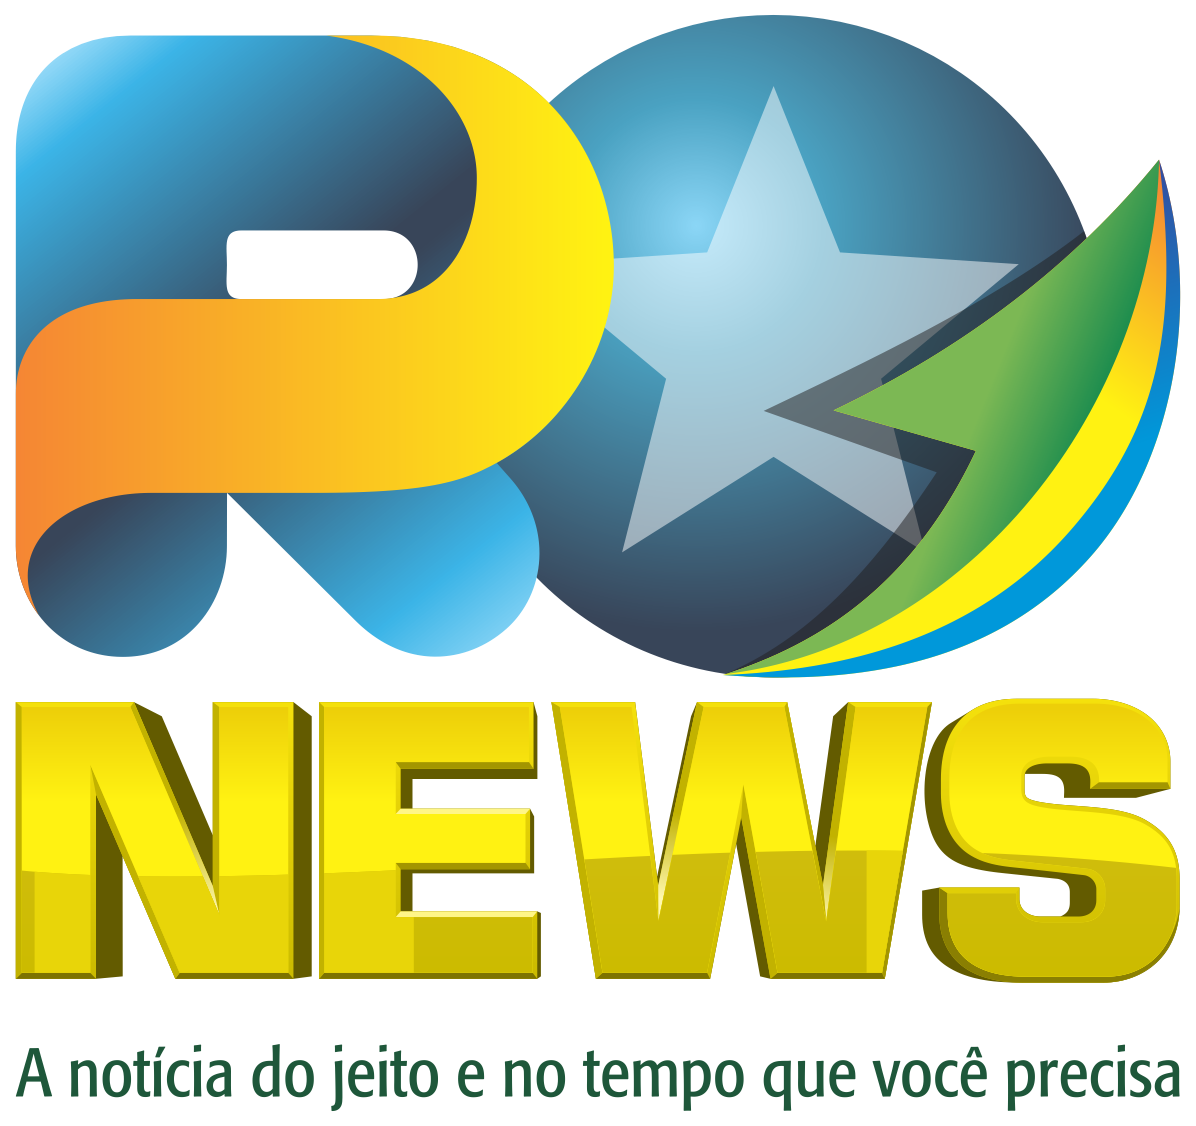 ro1news